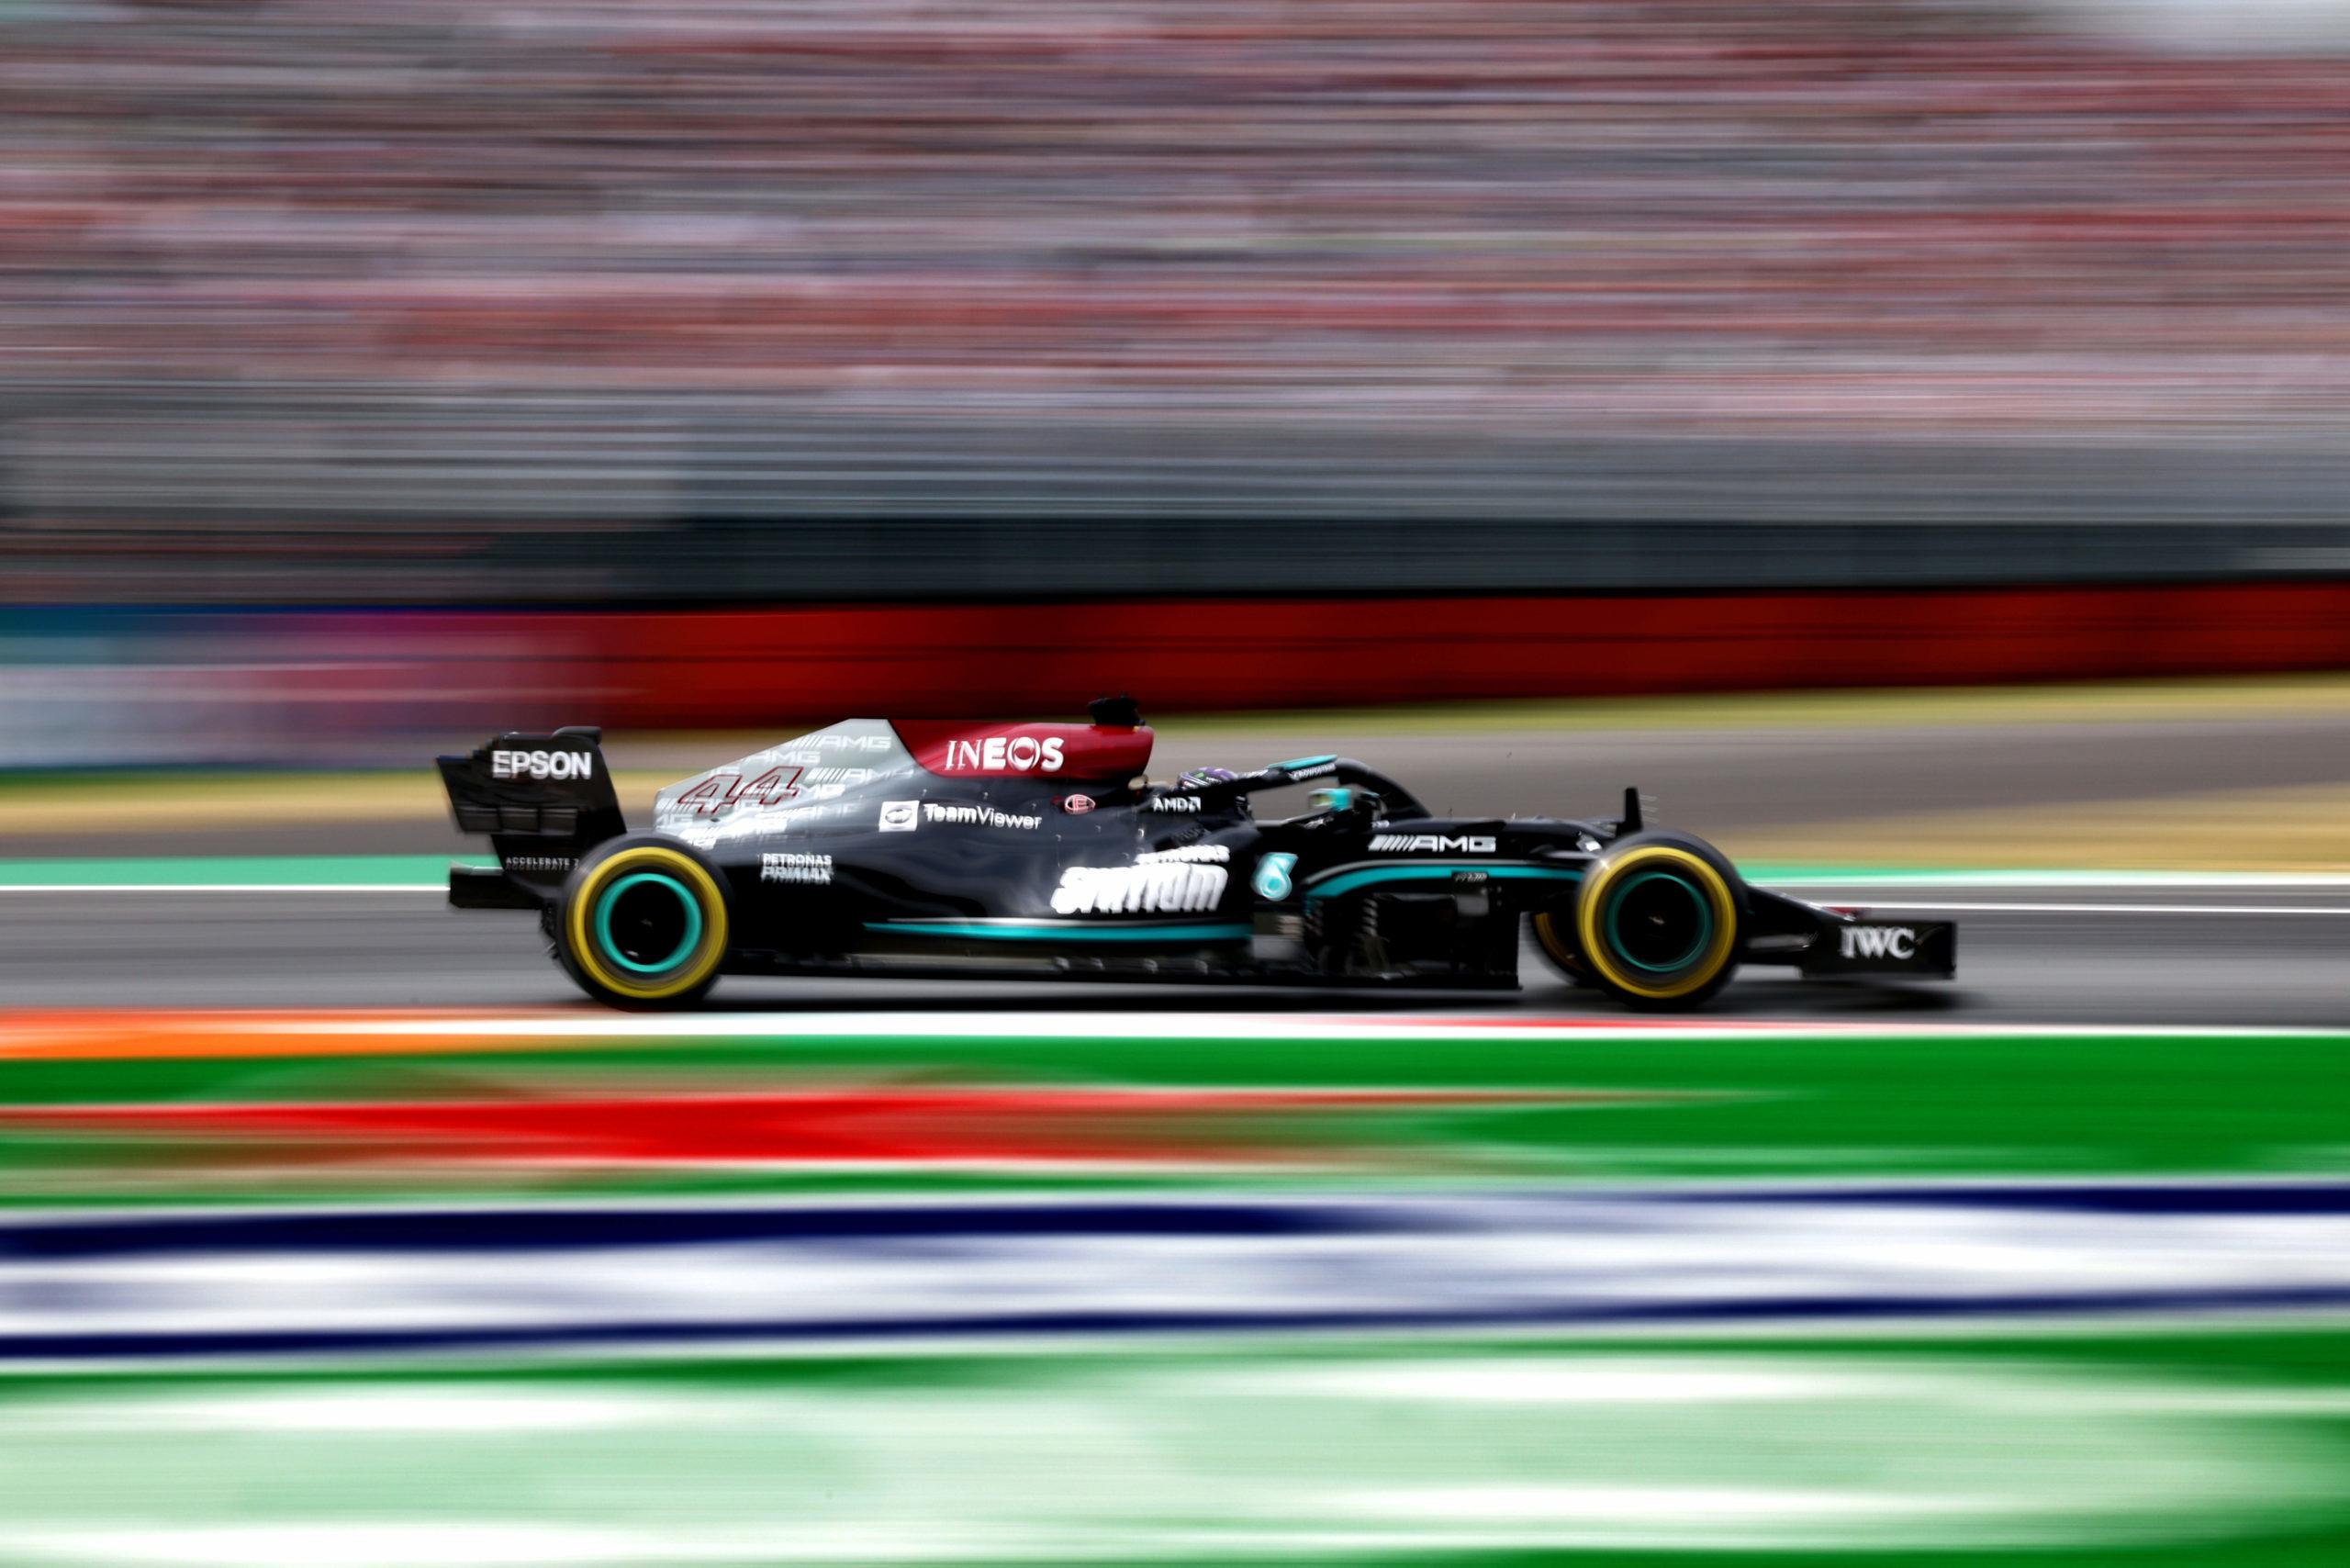 Lewis Hamilton, Mercedes, 2021 Italian Grand Prix, Friday - Steve Etherington